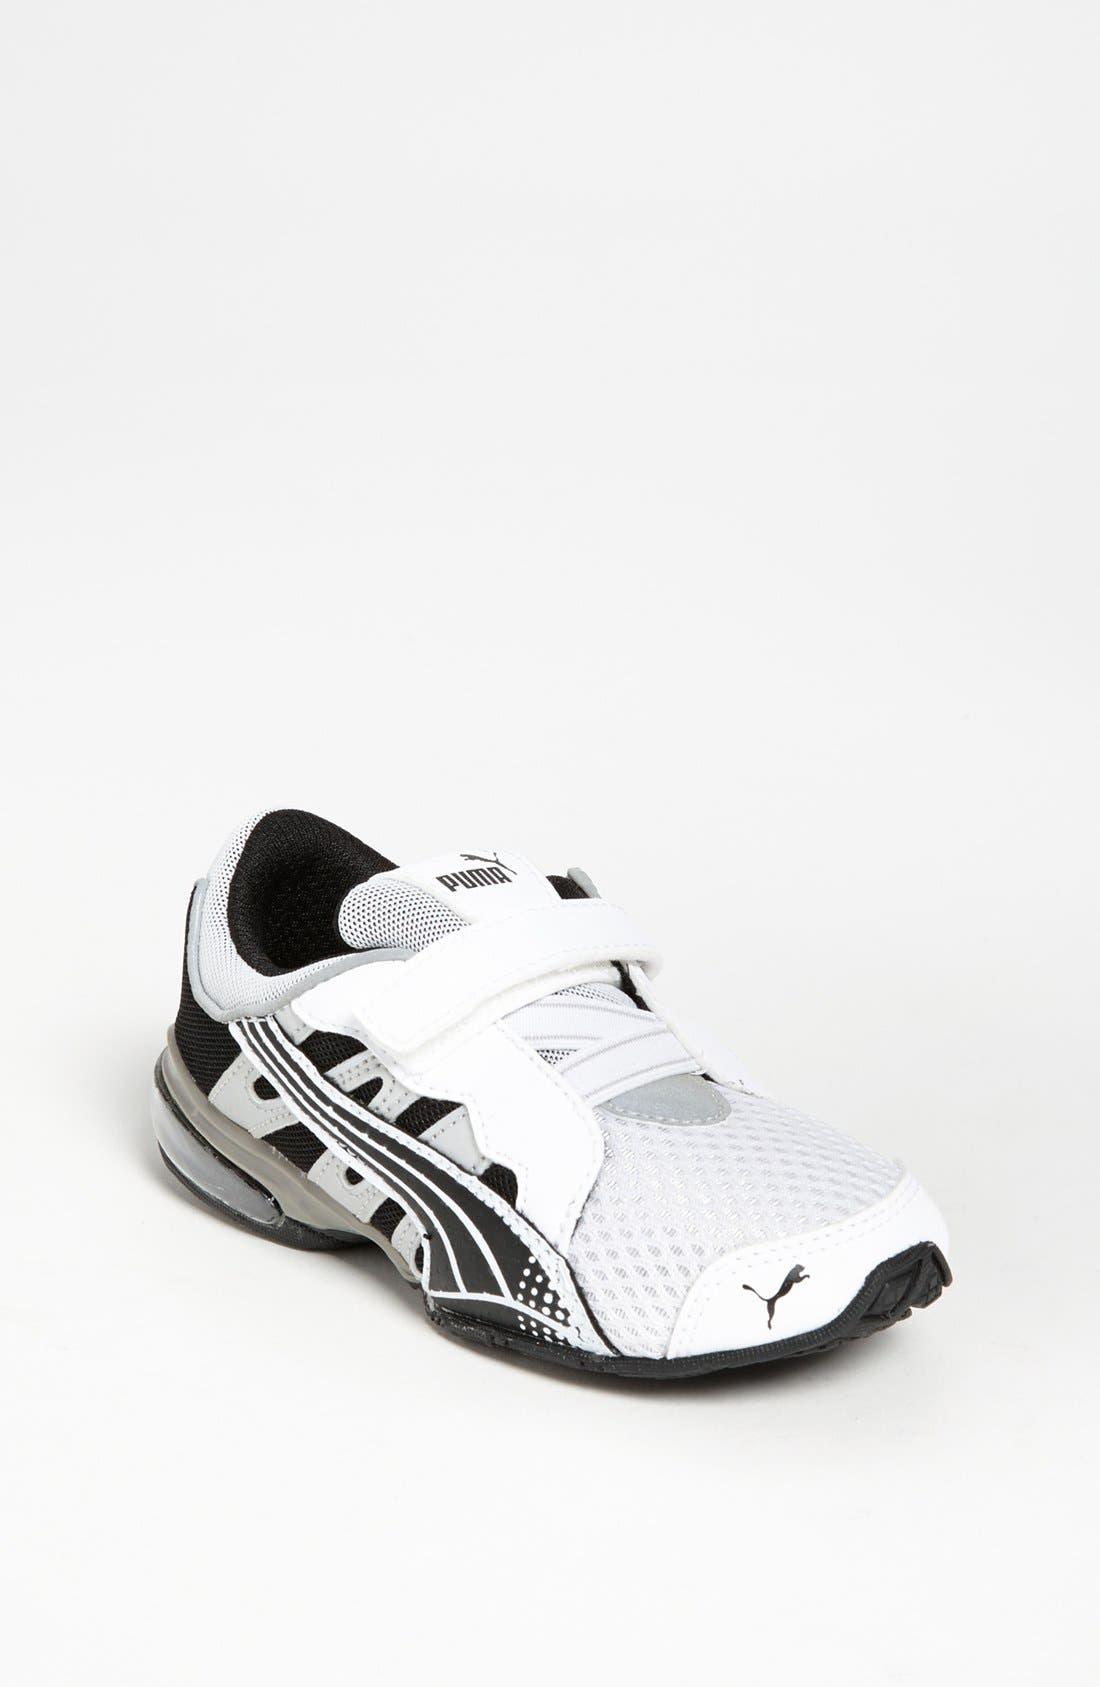 Alternate Image 1 Selected - PUMA 'Voltaic V' Sneaker (Baby, Walker, Toddler, Little Kid & Big Kid)